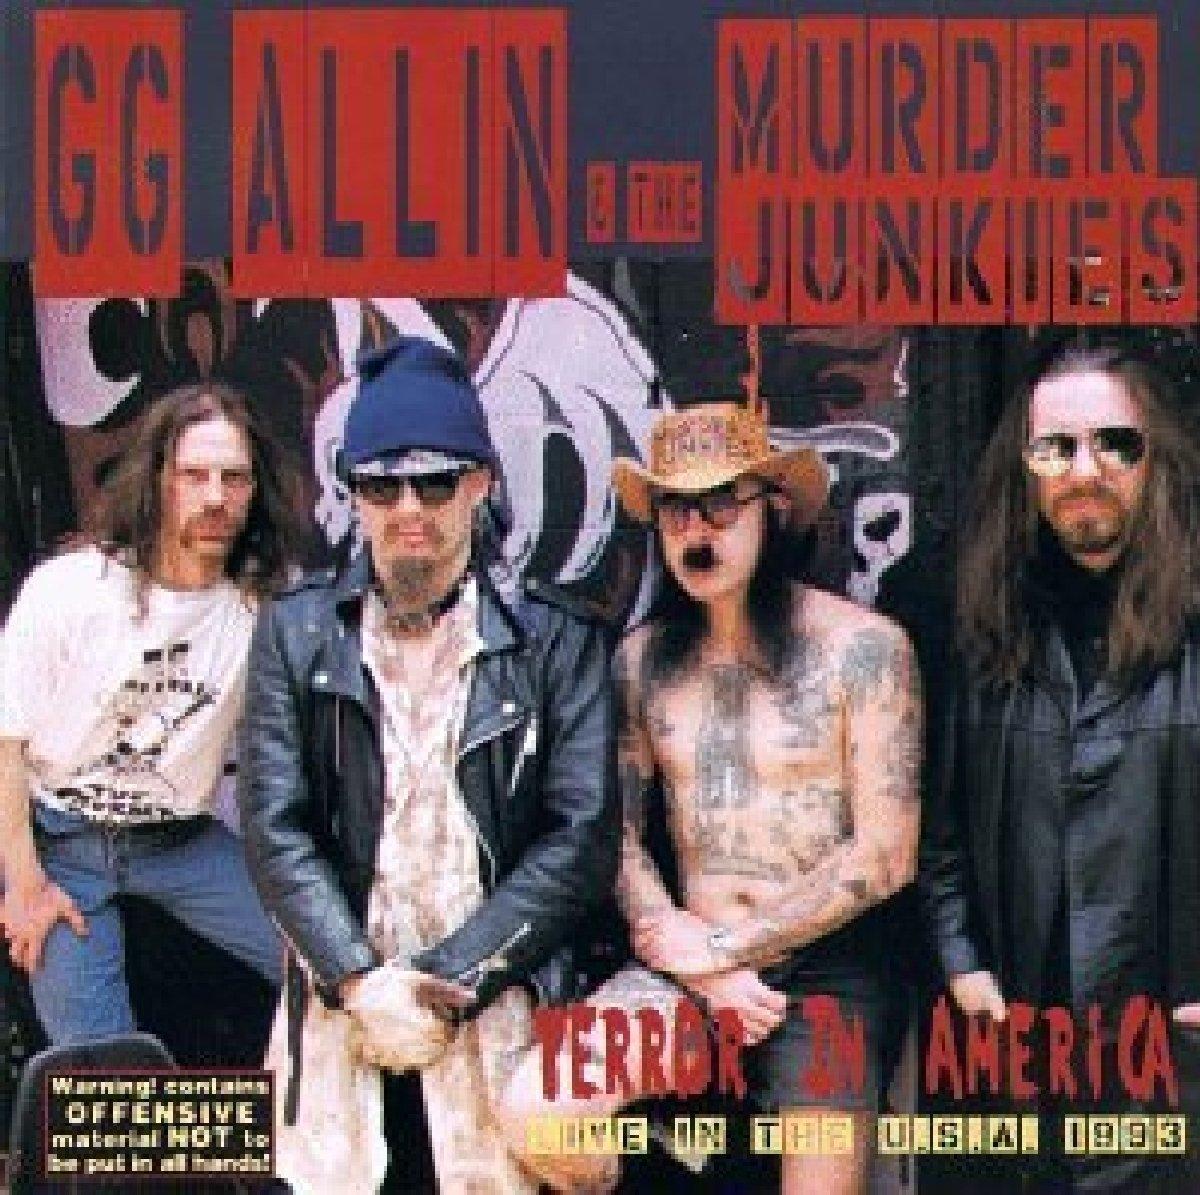 Terror in America [Vinyl] by Alive Records